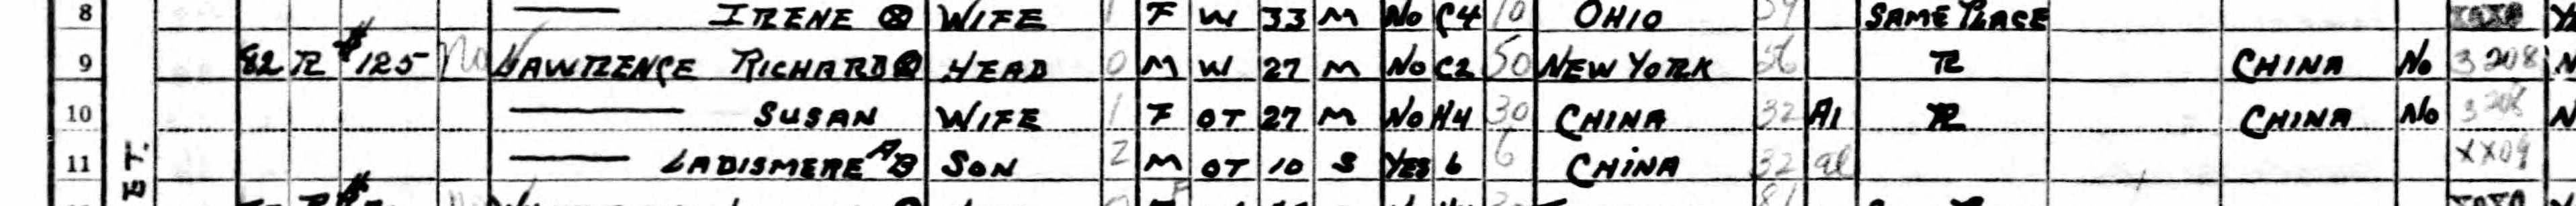 m-t0627-02654-00582 1940 Census detail